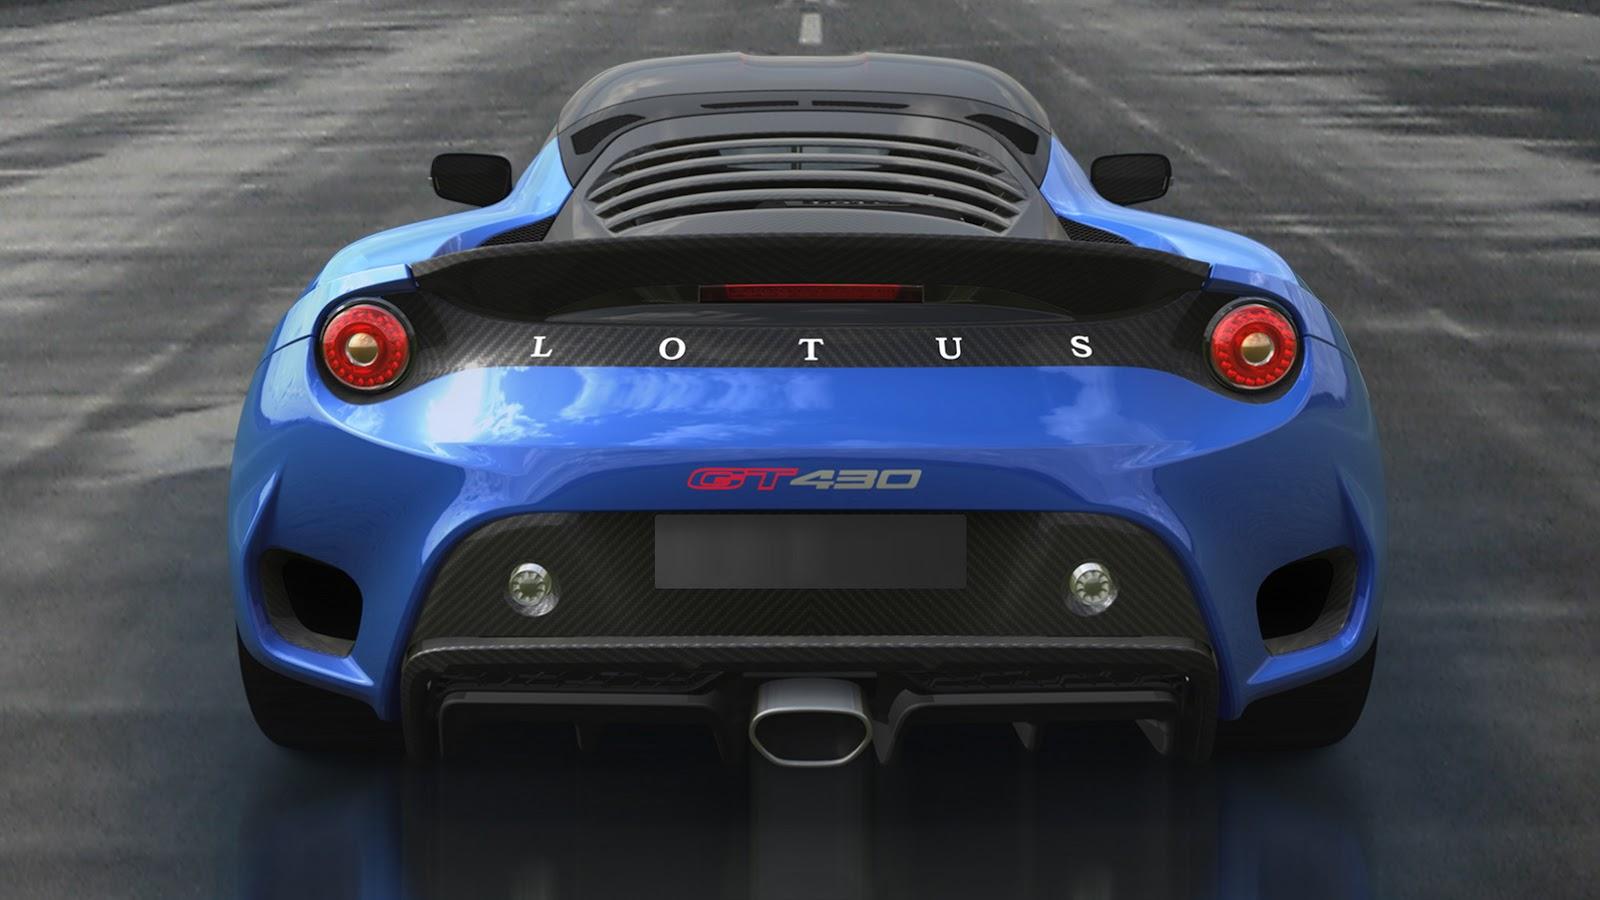 Photo of Ποια είναι η ταχύτερη Lotus που μπορεί να αποκτήσει κανείς;